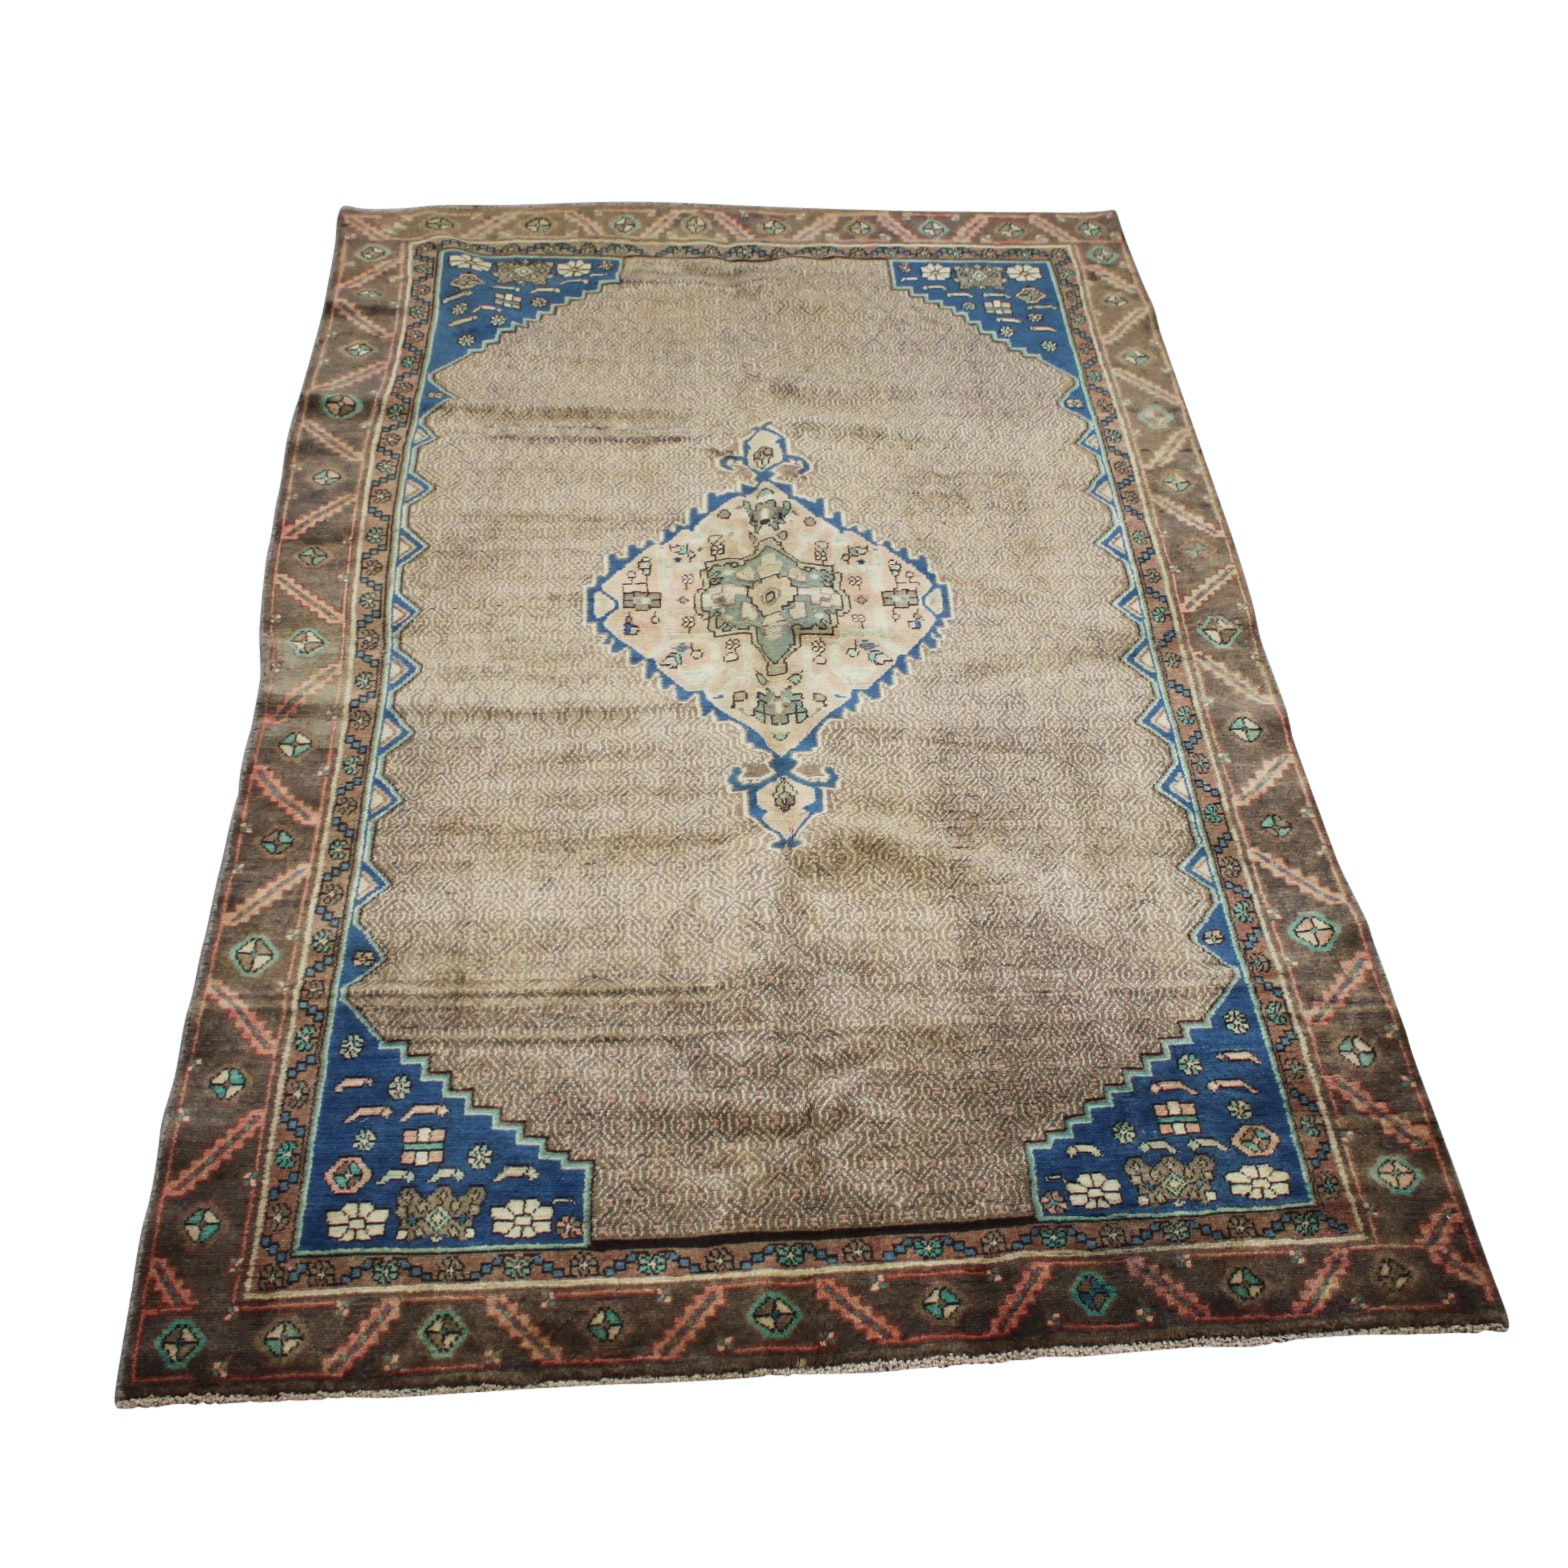 Vintage Hand-Knotted Persian Senneh Bijar Area Rug